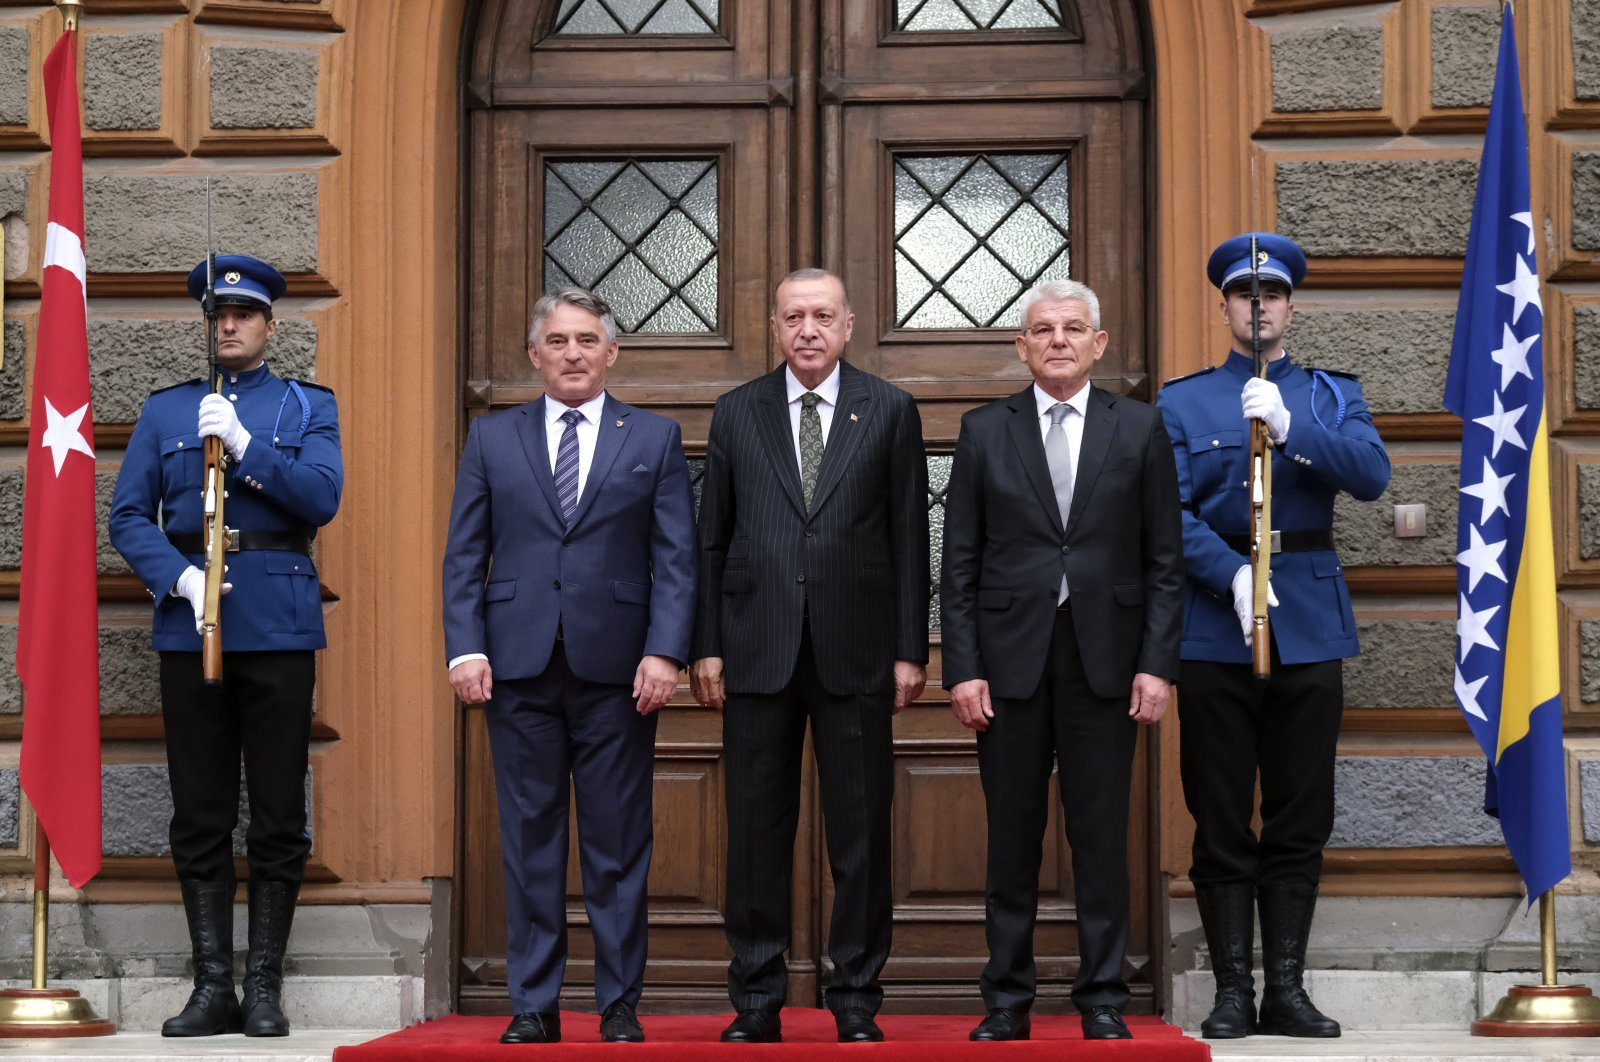 President Recep Tayyip Erdoğan (C) poses with Croat member of the tripartite Presidency of Bosnia Zeljko Komsic (L) and Muslim member of the tripartite Presidency of Bosnia Sefik Dzaferovic, in Sarajevo, Bosnia, Aug. 27, 2021. (AP Photo)